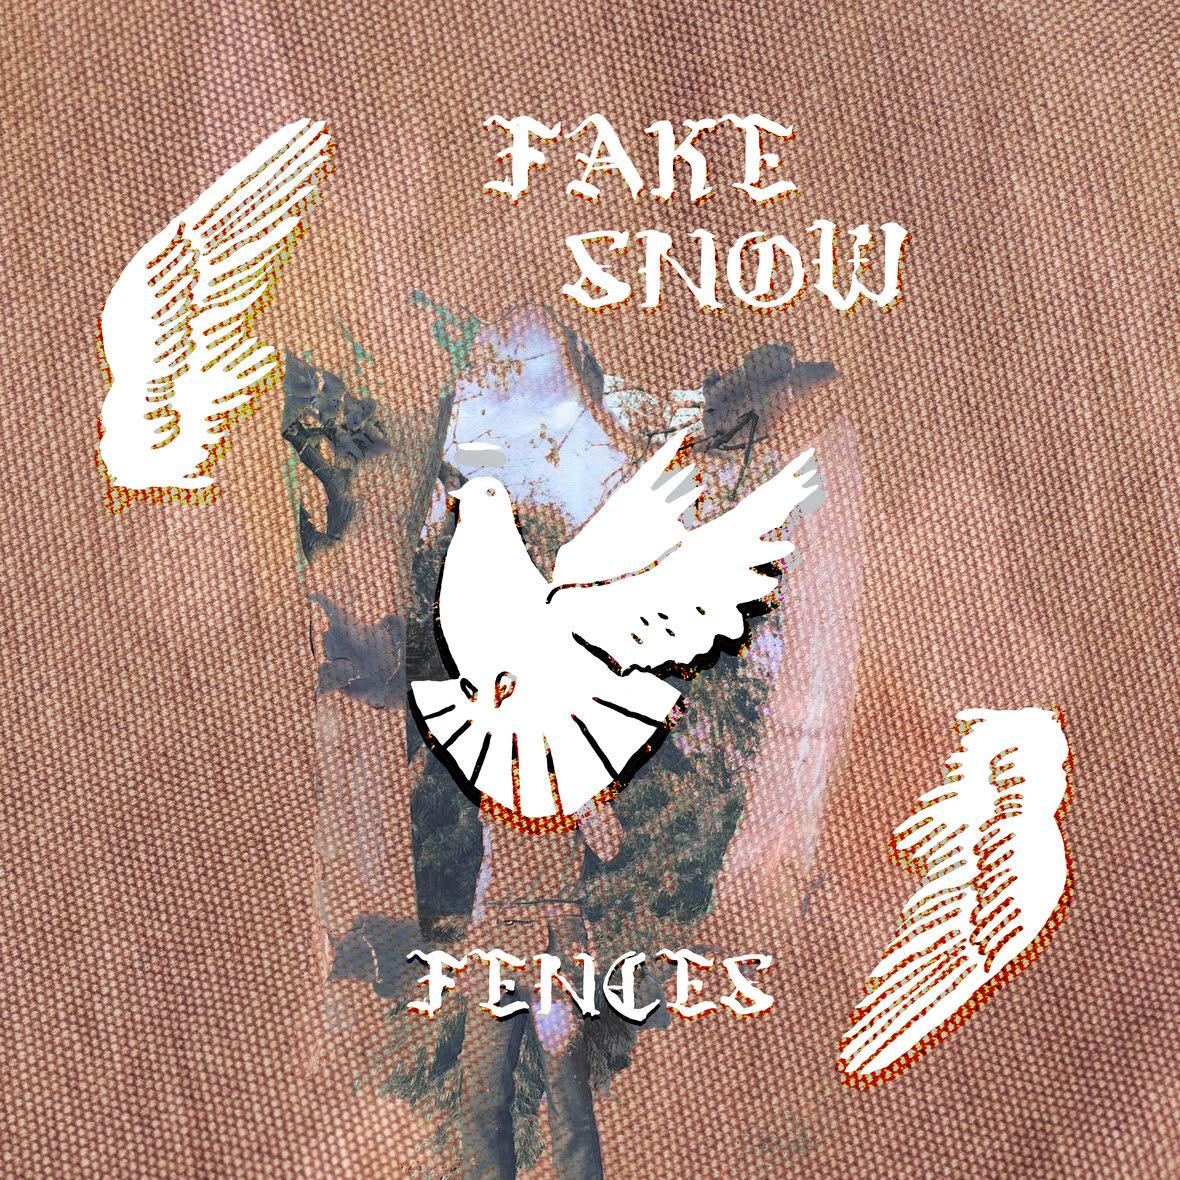 fake snow single cover